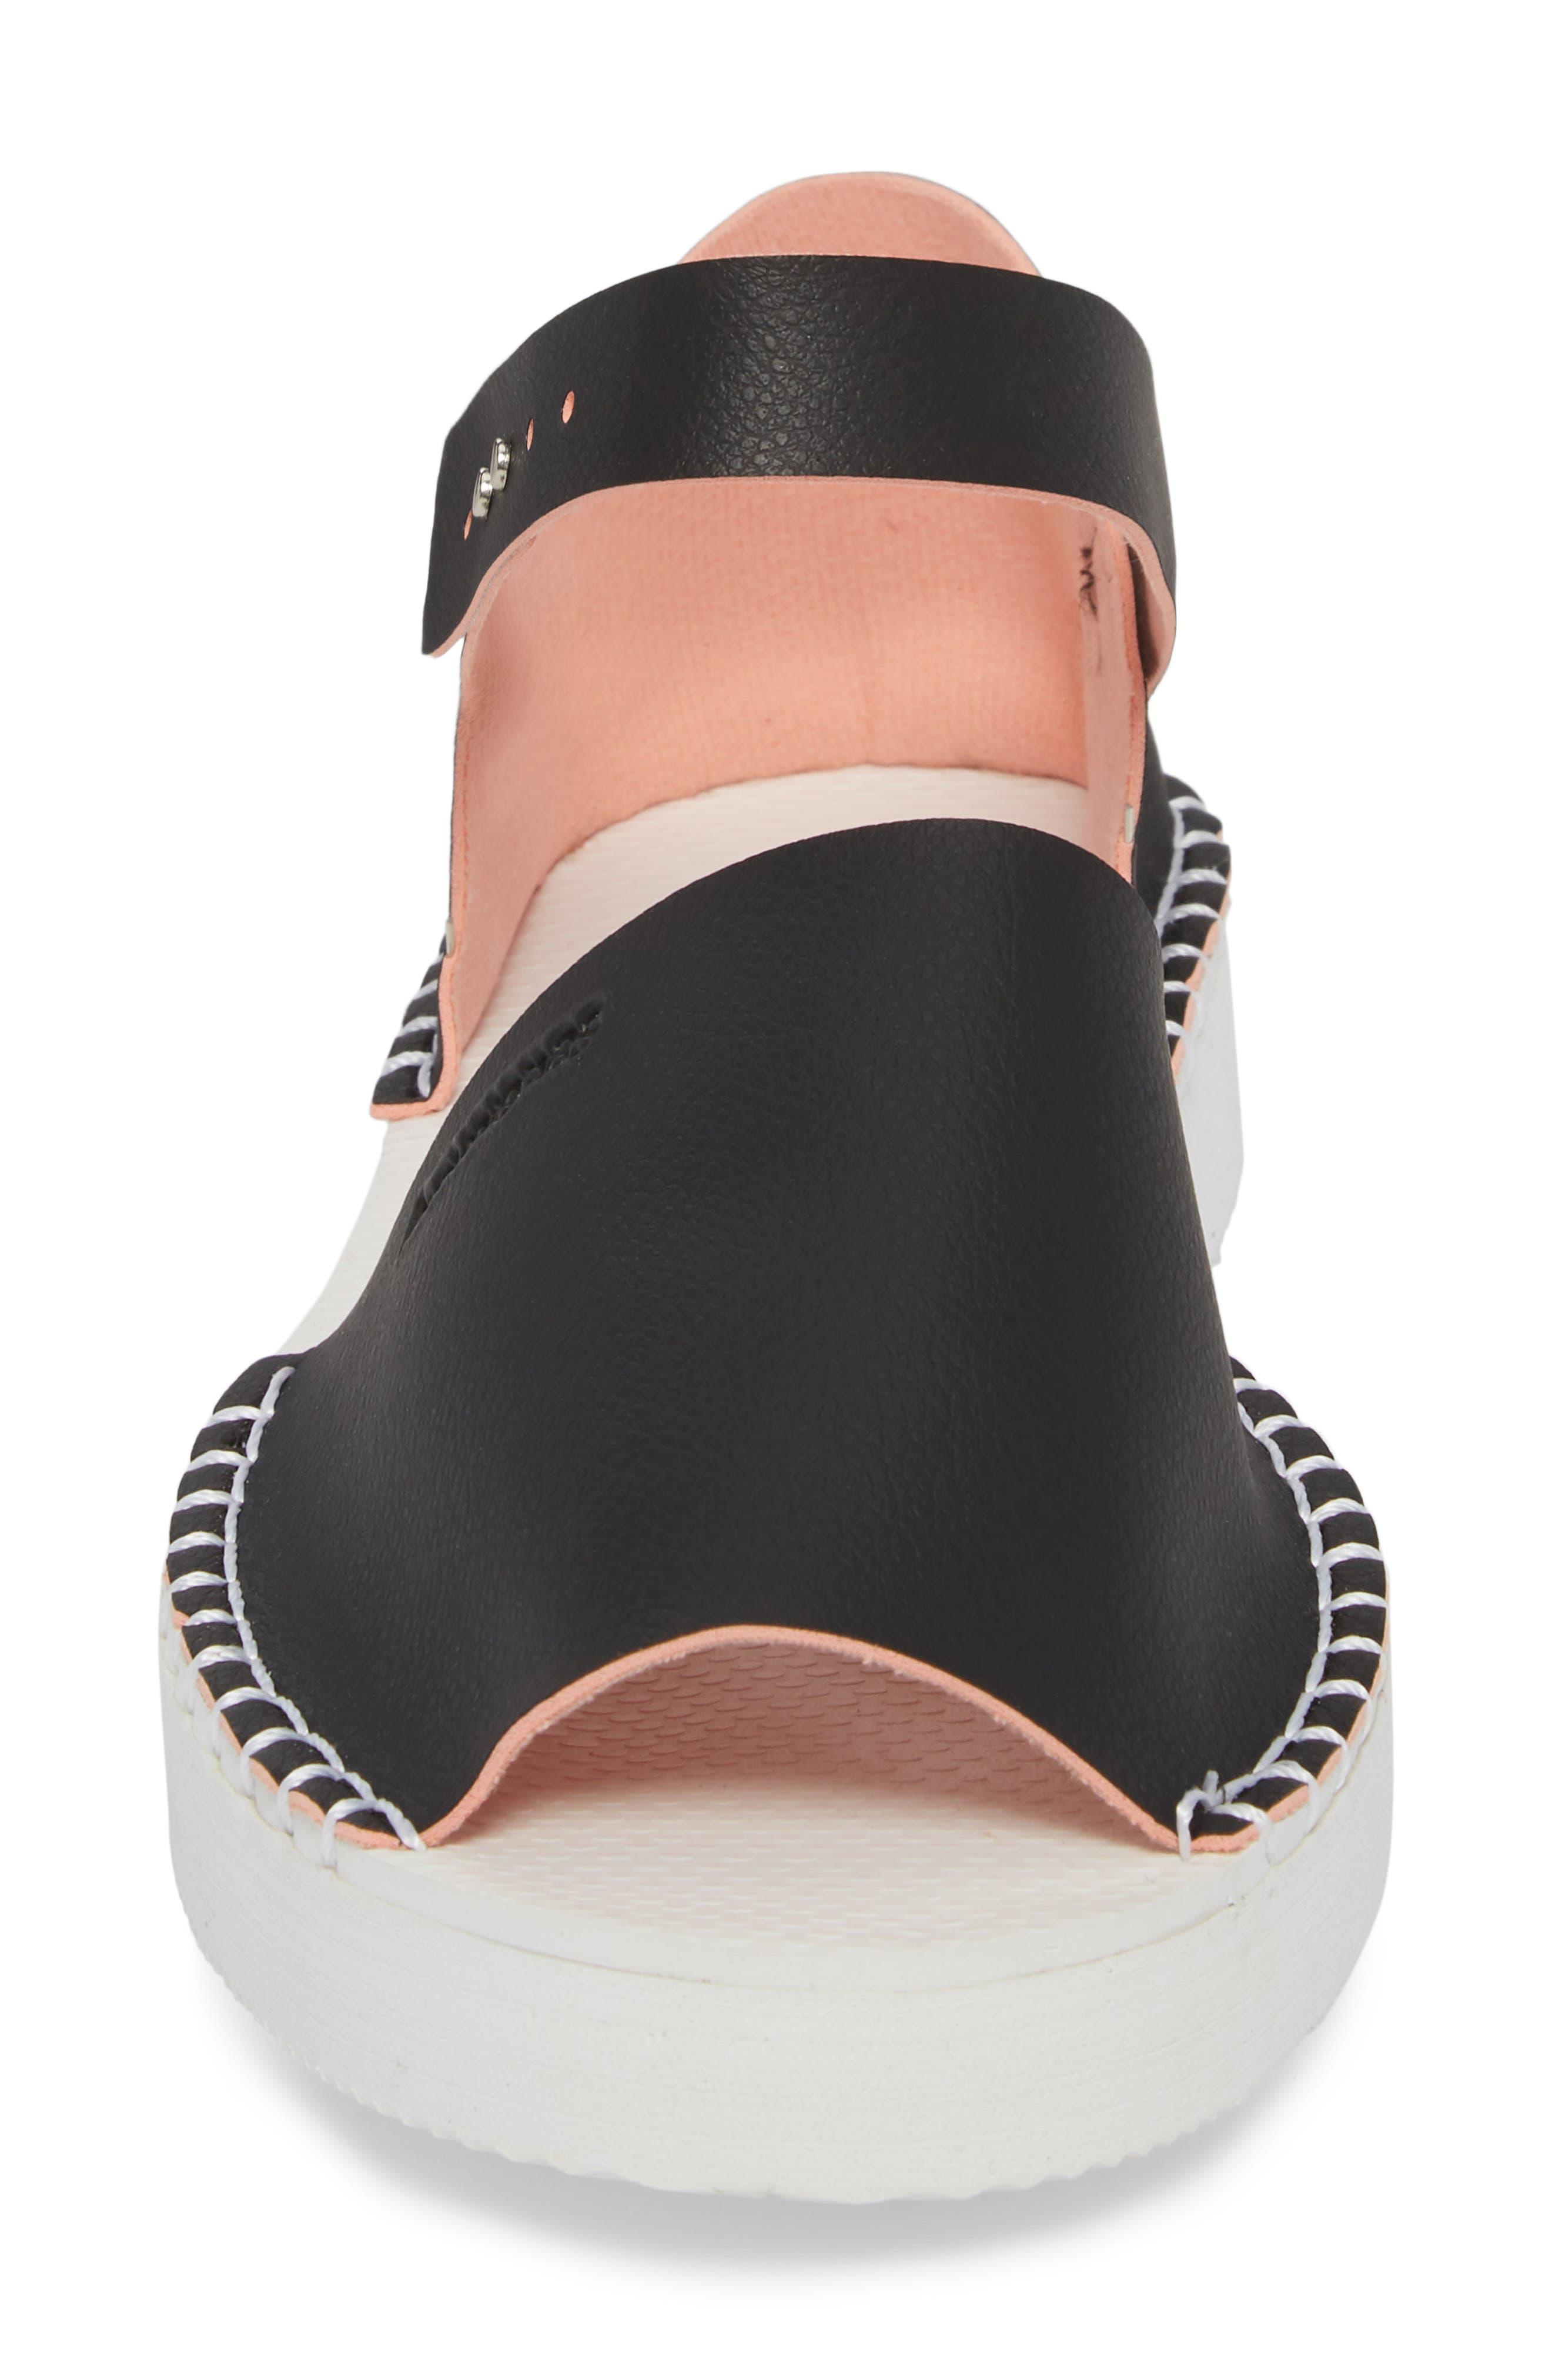 Flatform Fashion Sandal,                             Alternate thumbnail 4, color,                             BLACK/ PINK